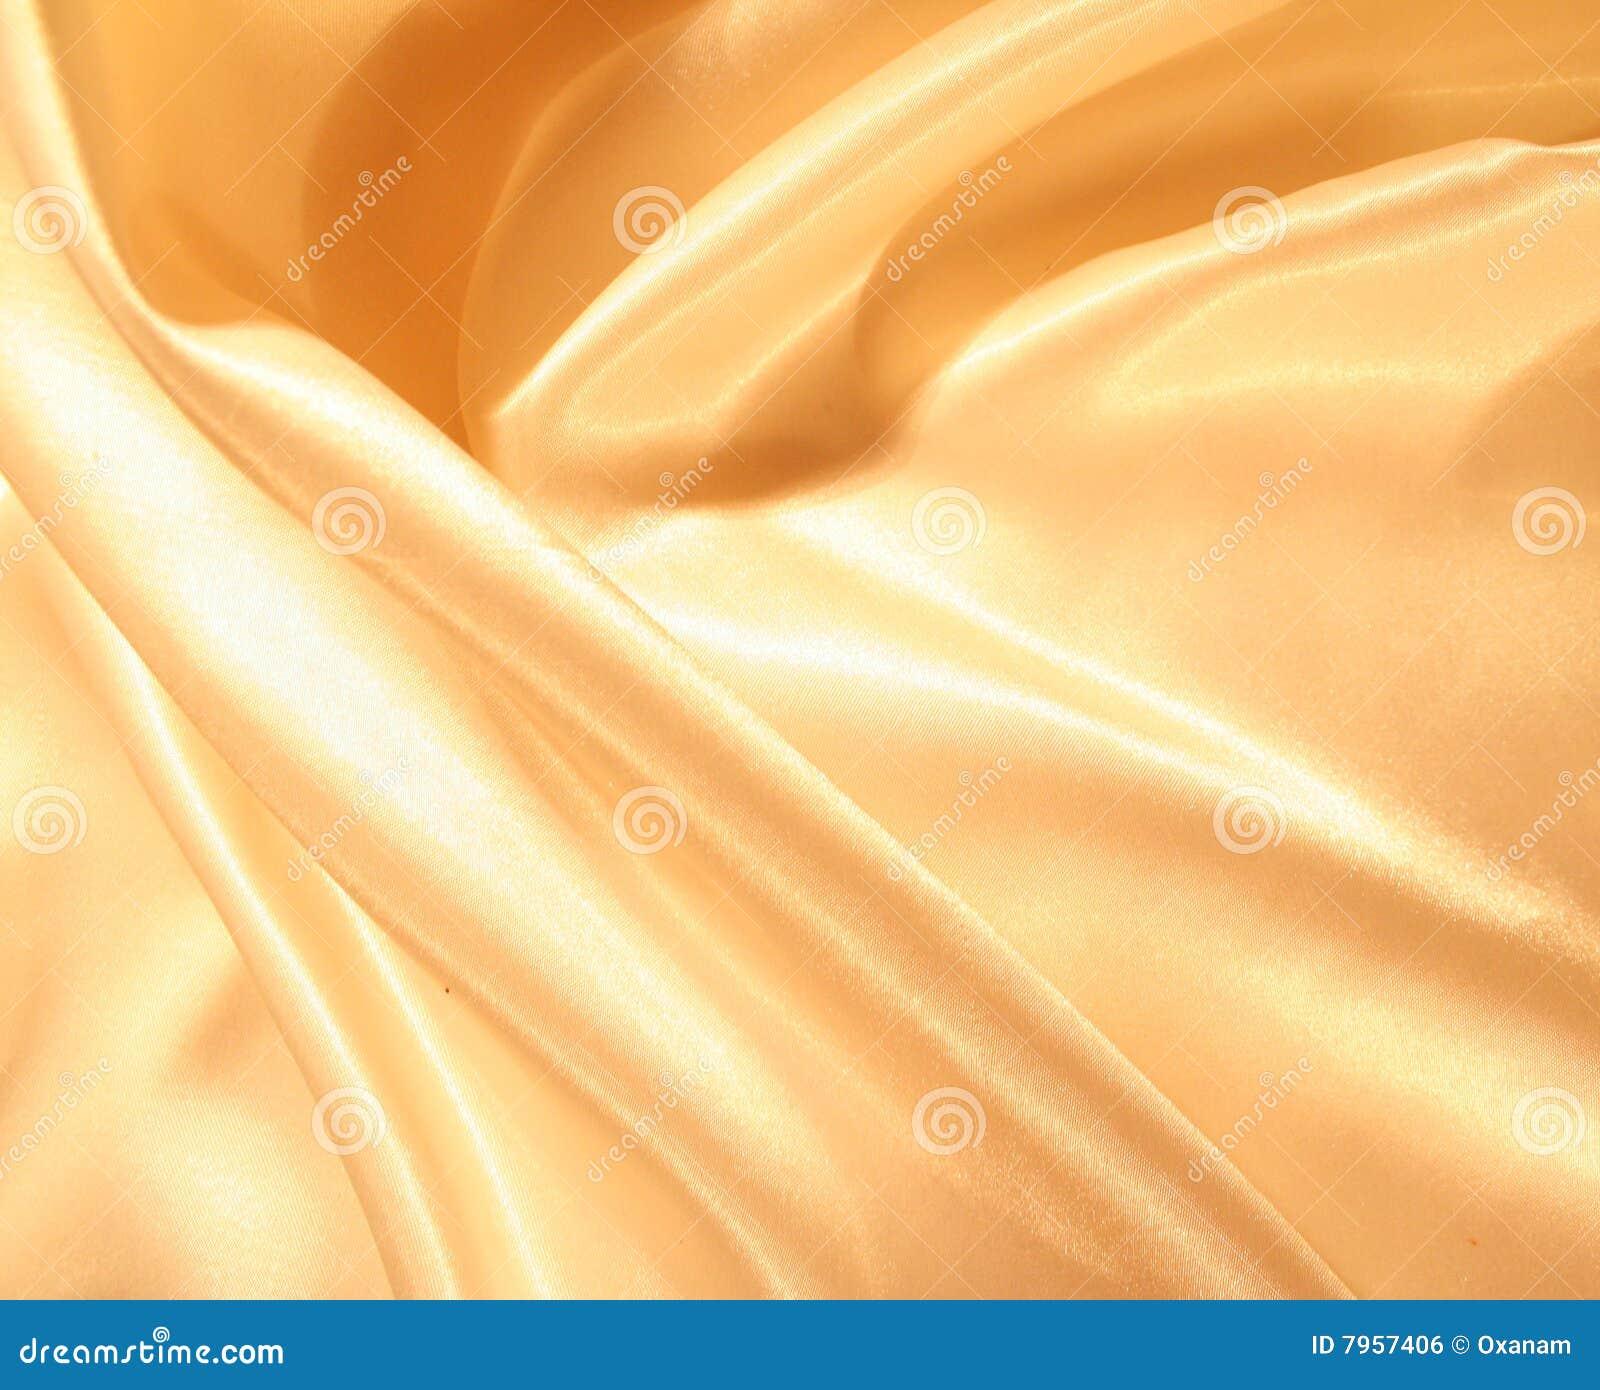 gold satin background - photo #15